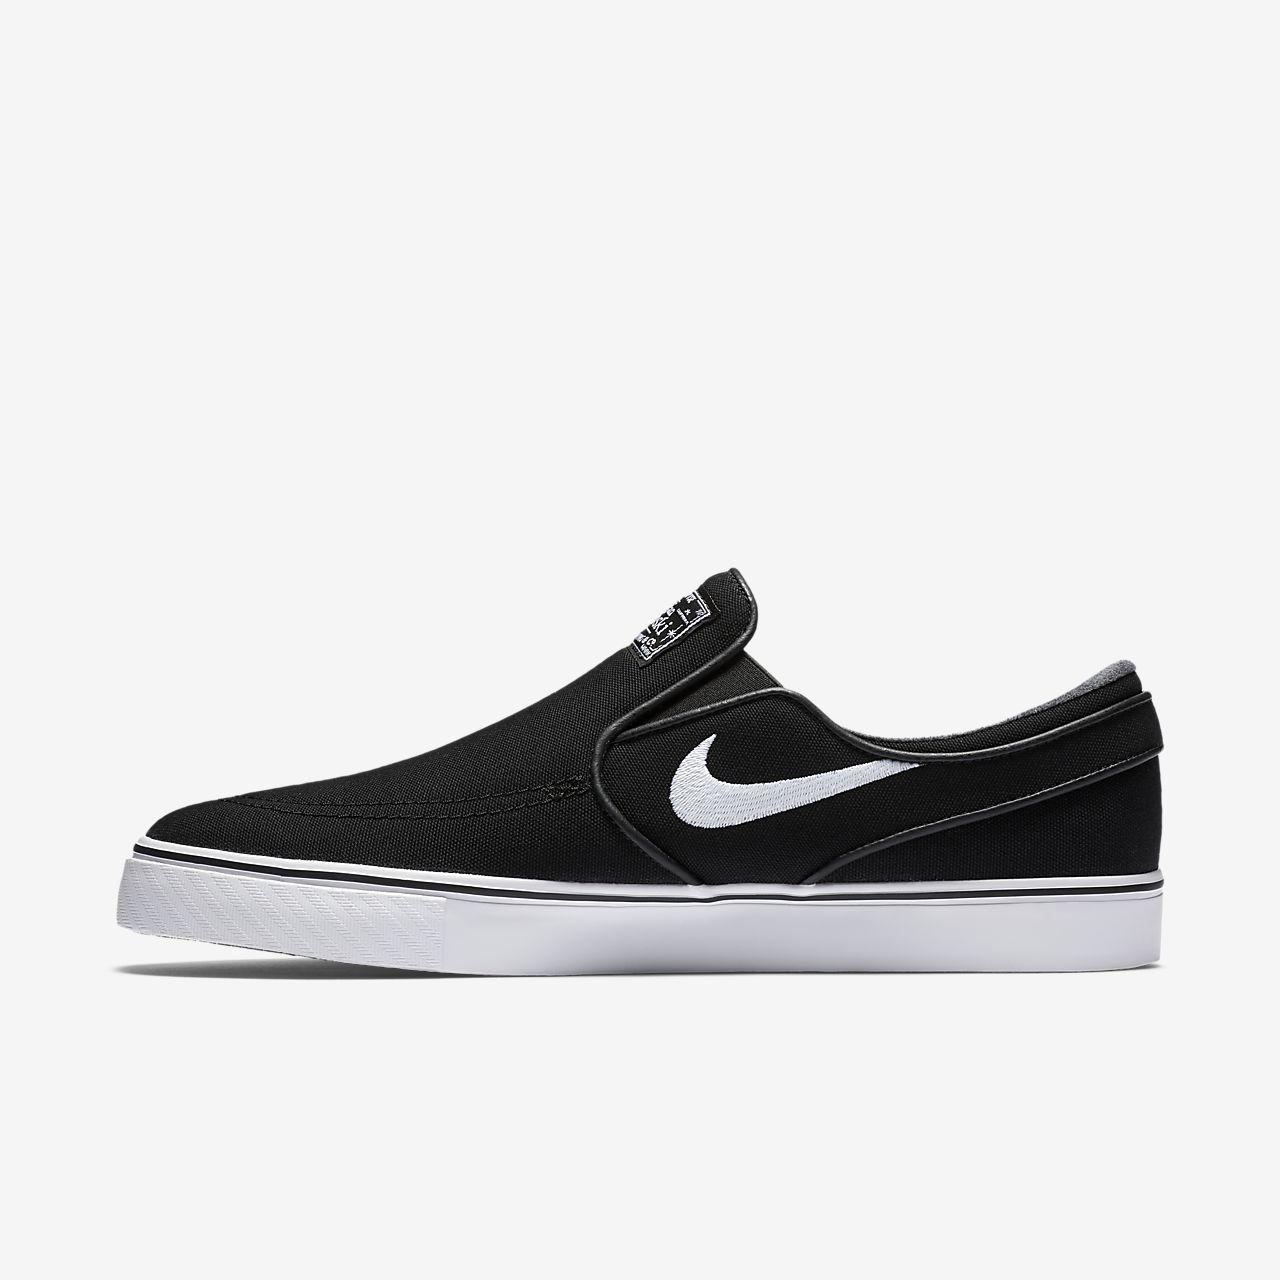 ce82ed77bacbb Nike SB Zoom Stefan Janoski Slip-On Canvas Men s Skateboarding Shoe ...